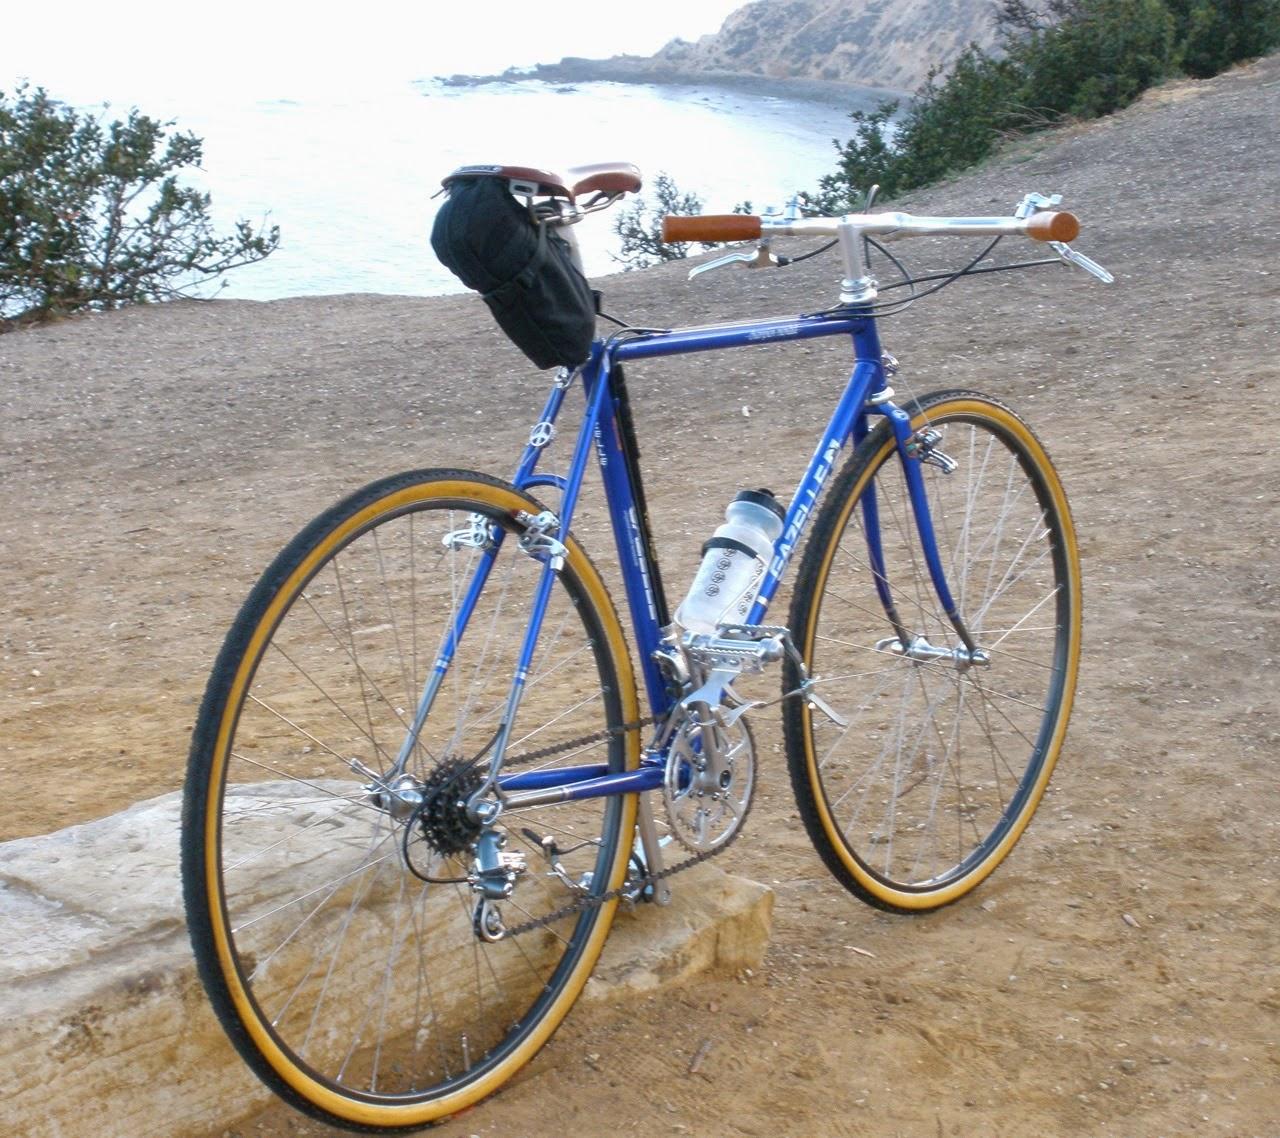 Gazelle cyclocross bike, bicycle, build, Jonsan, Holland, Netherlands, Dutch, California